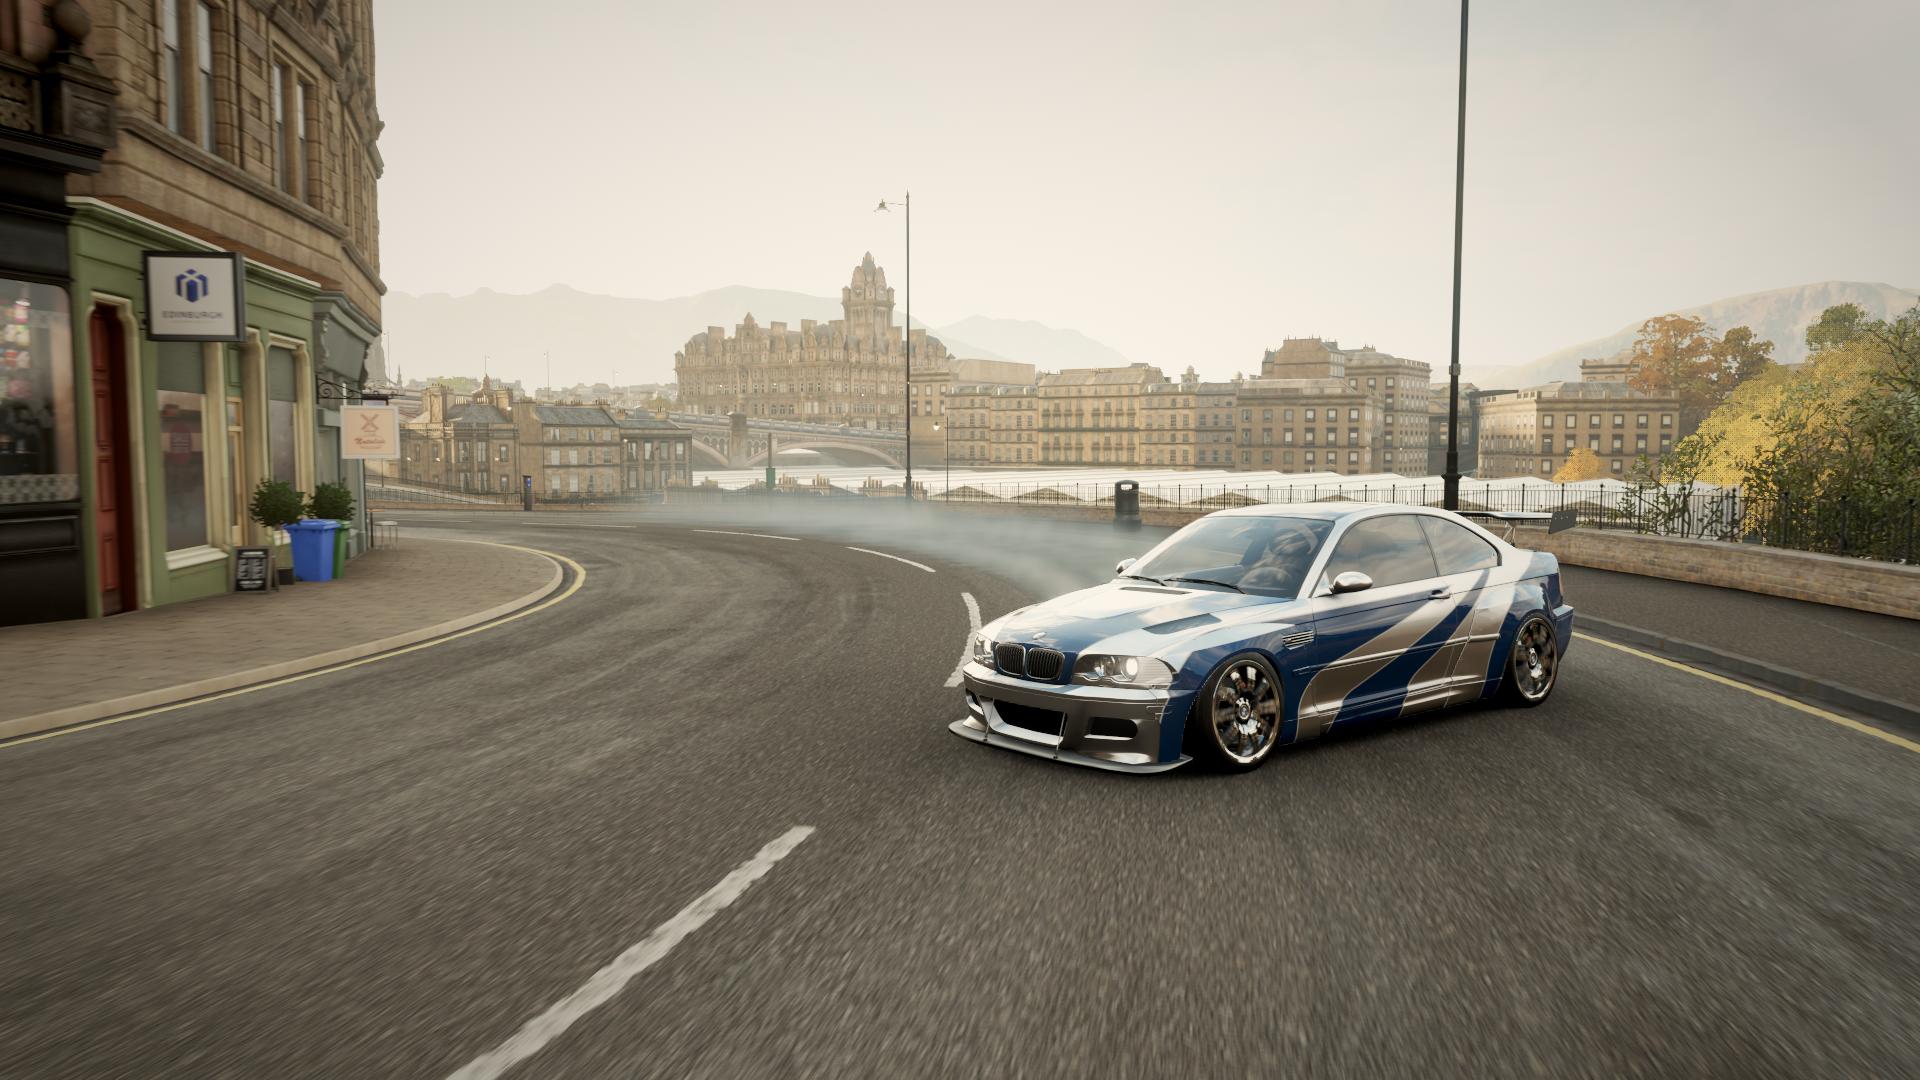 Wallpaper E 46 Forza Horizon 4 Need For Speed Need For Speed